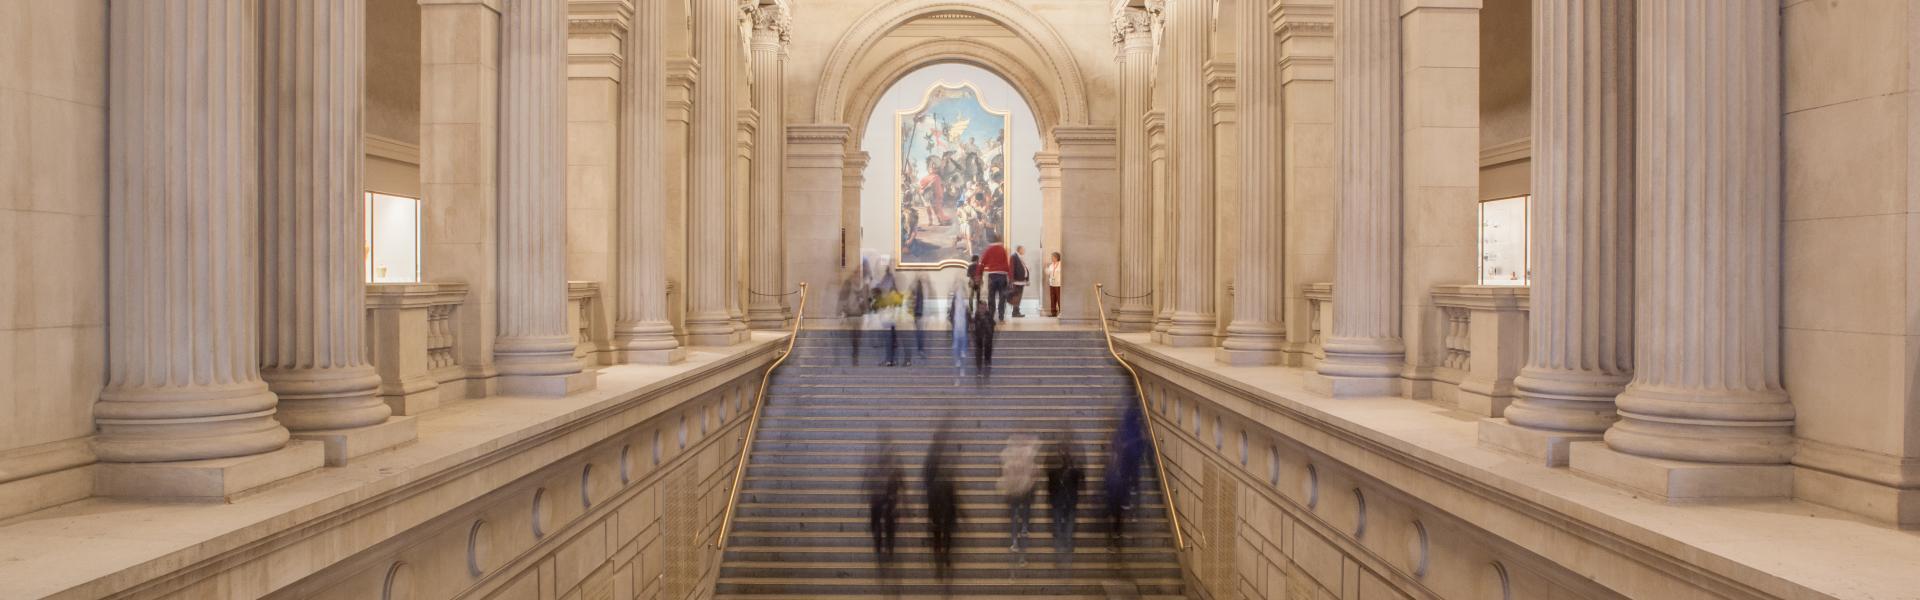 MetMuseum_UpperEastSide_Manhattan_NYC_Tagger-Yancey-IV-5194